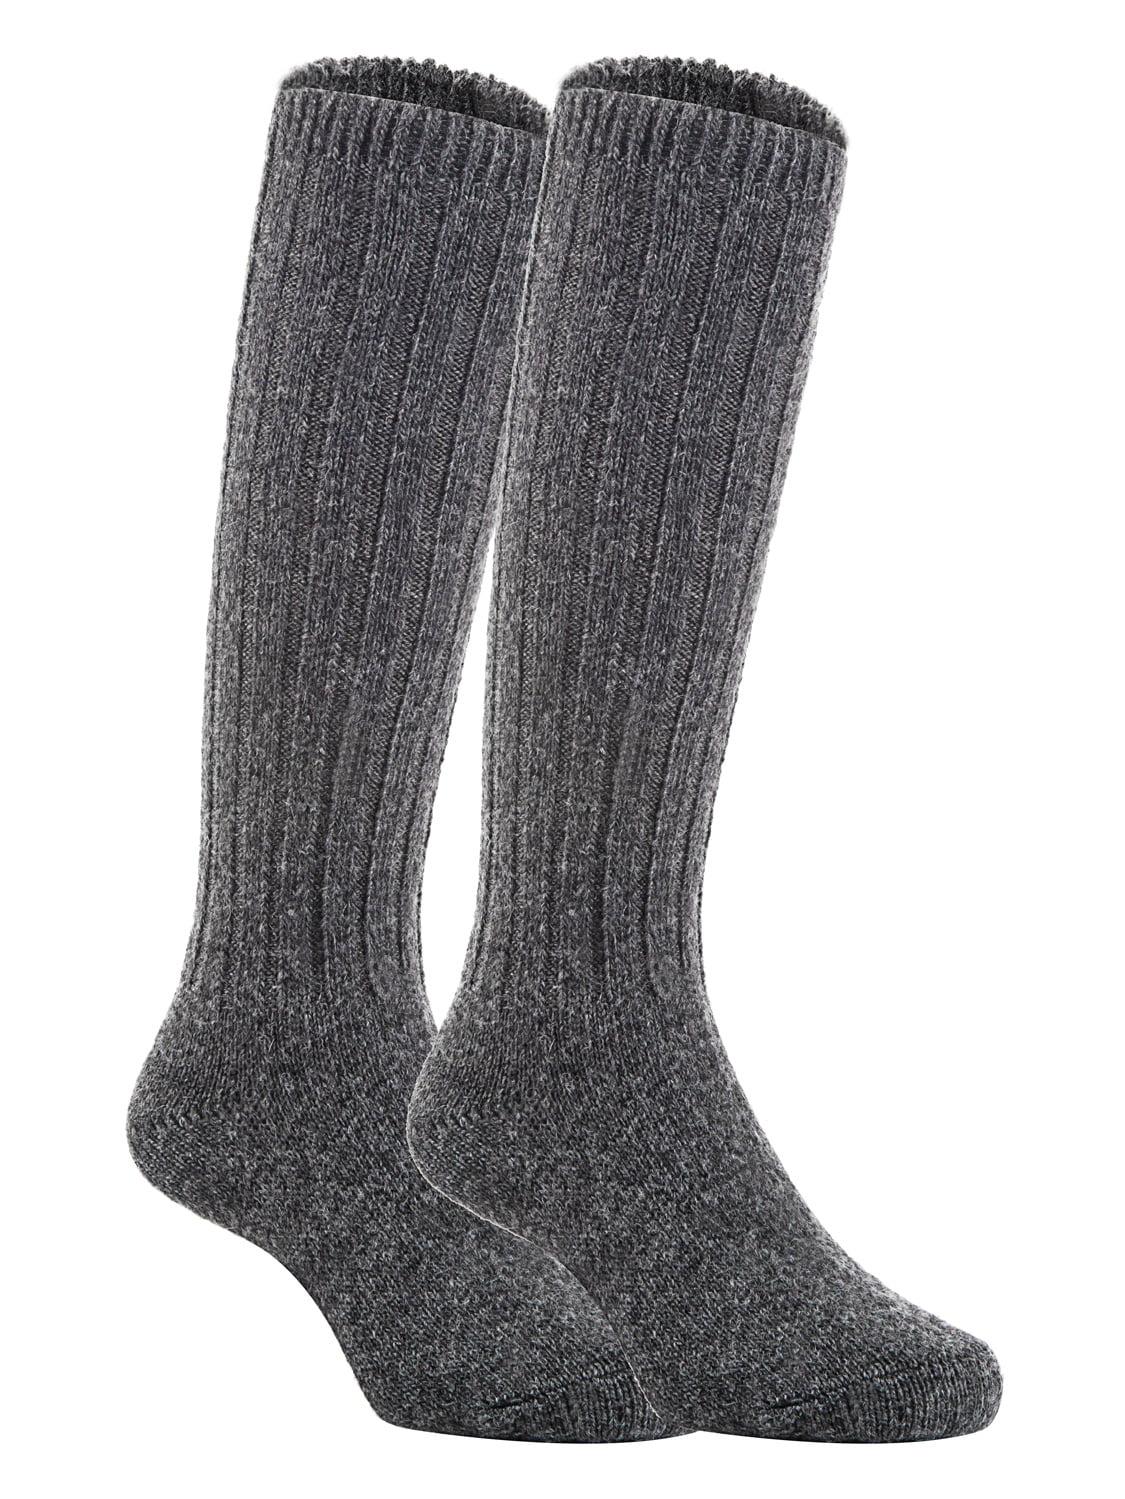 Lian LifeStyle Unisex Baby Children 3 Pairs Knee High Wool Blend Boot Socks Size 0-2Y  (Dark Gray)